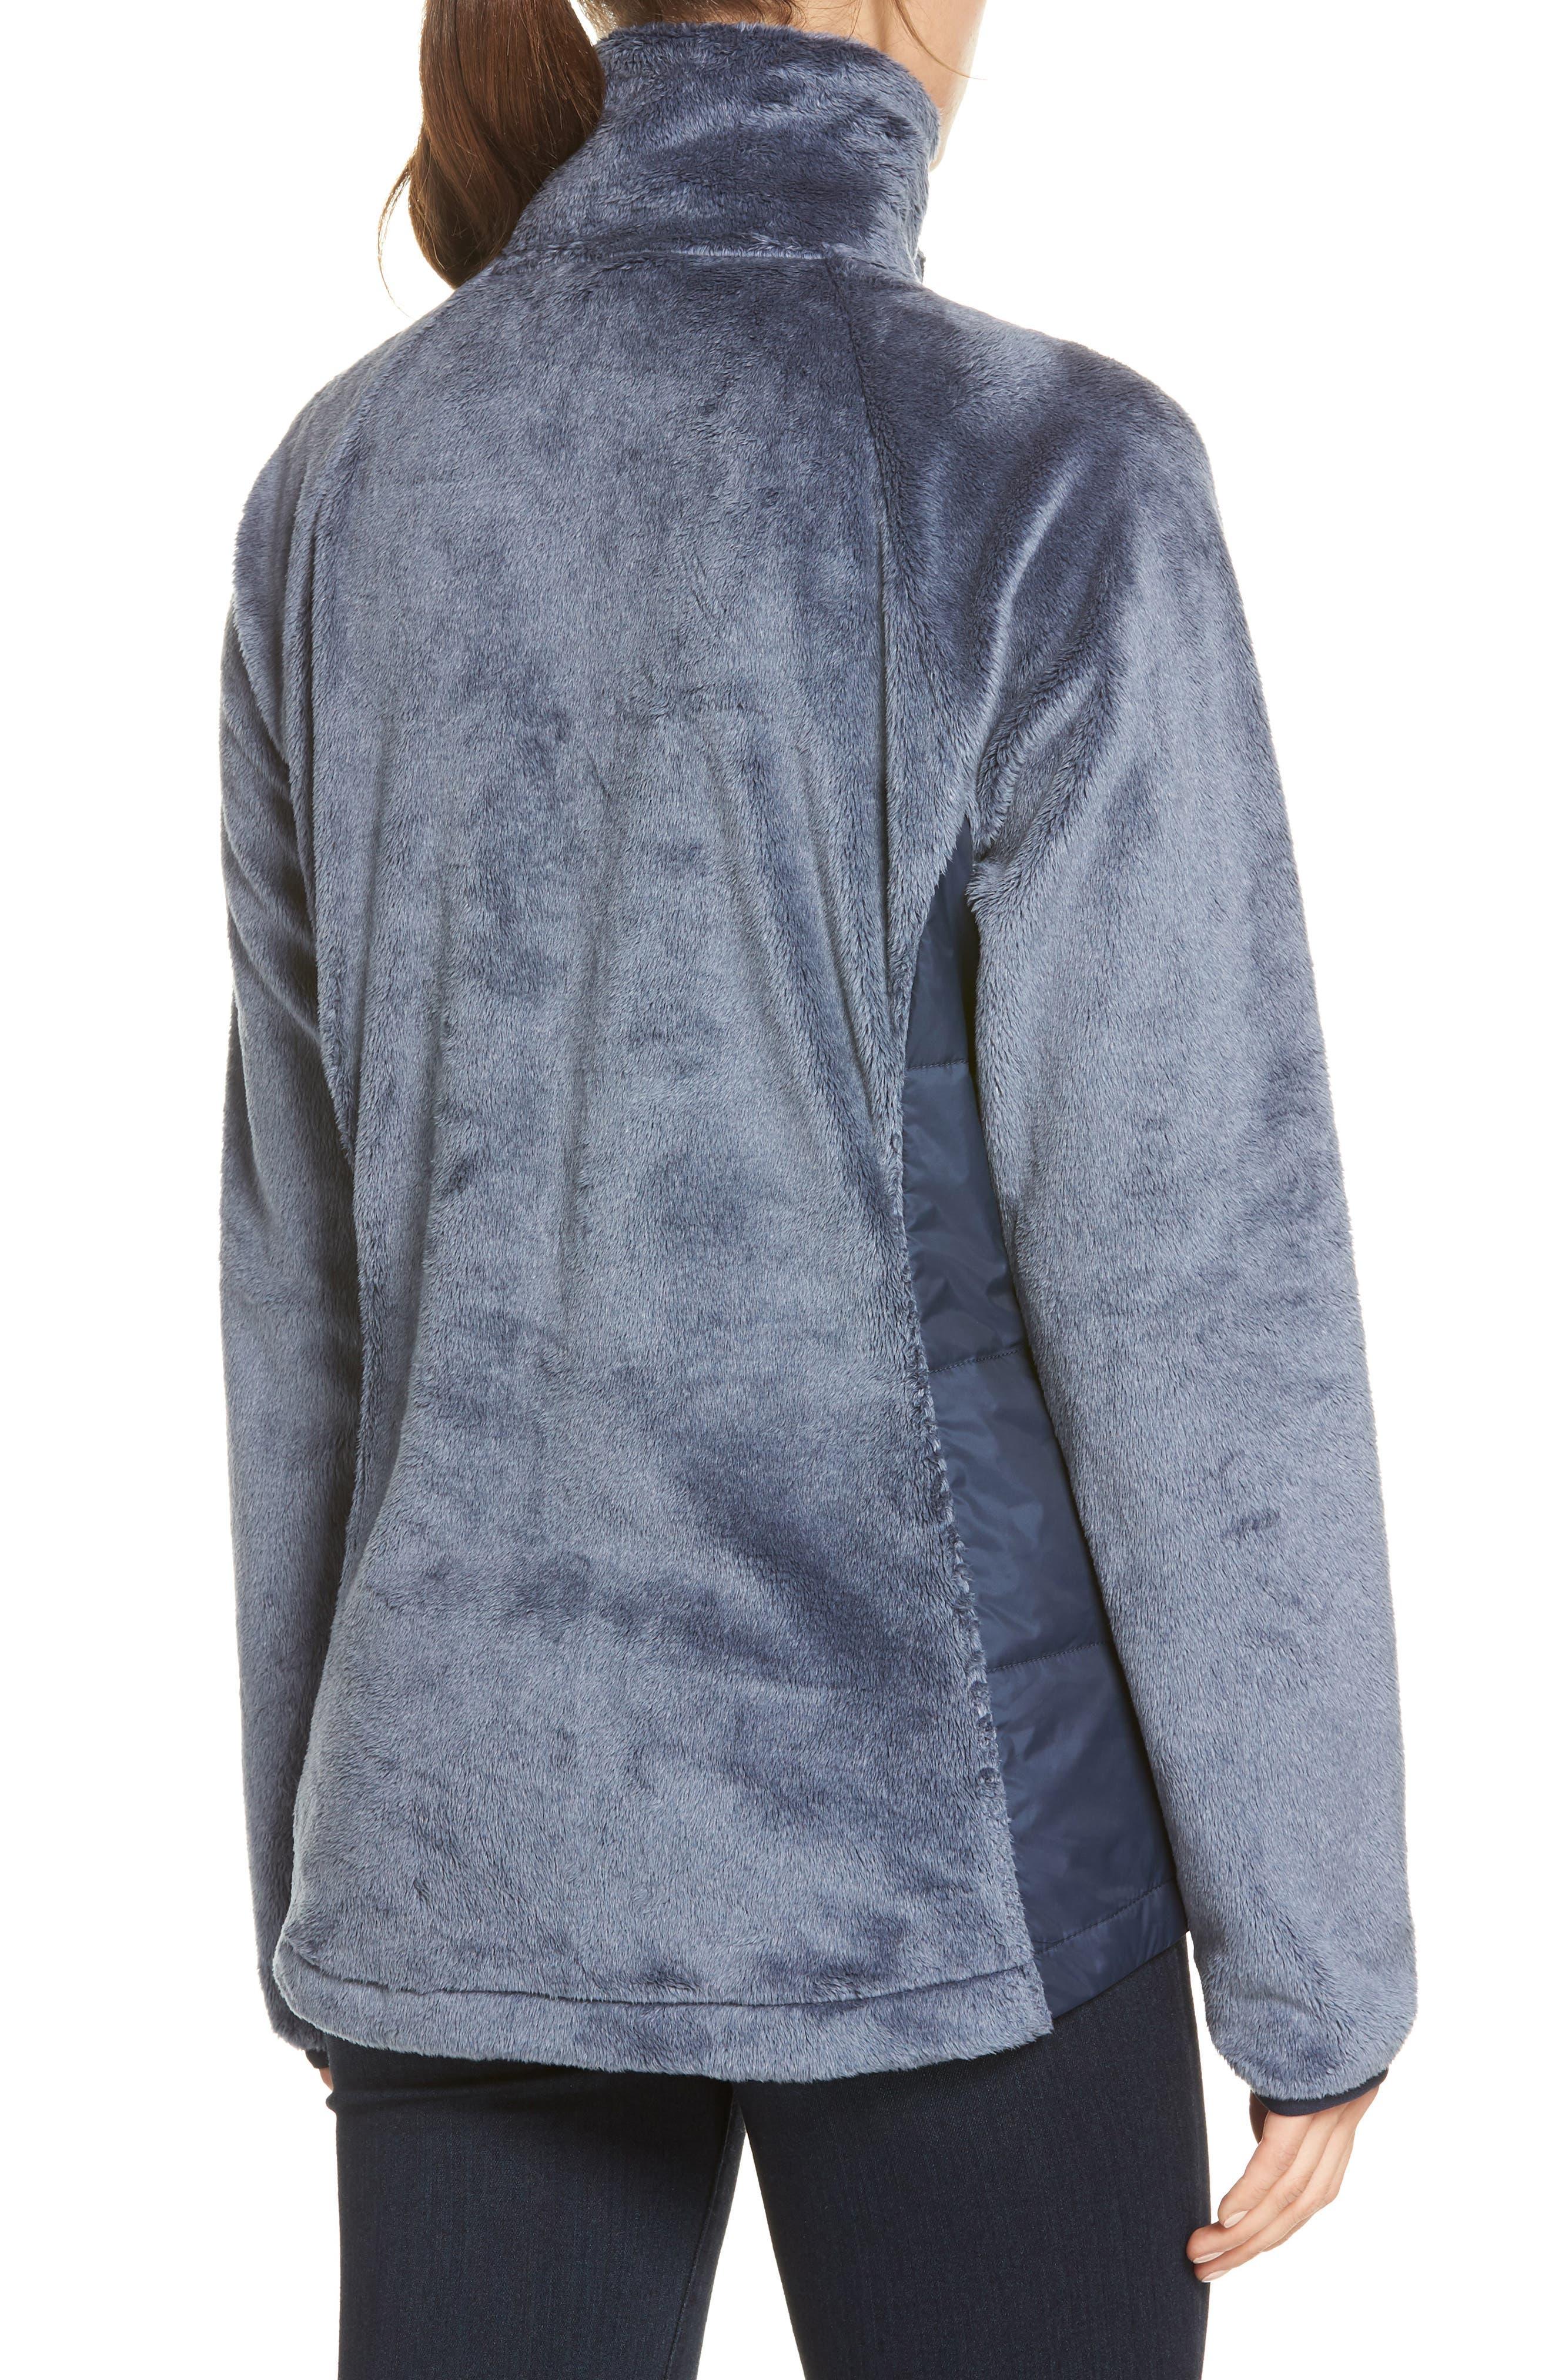 Osito Sport Hybrid Pullover Jacket,                             Alternate thumbnail 2, color,                             401